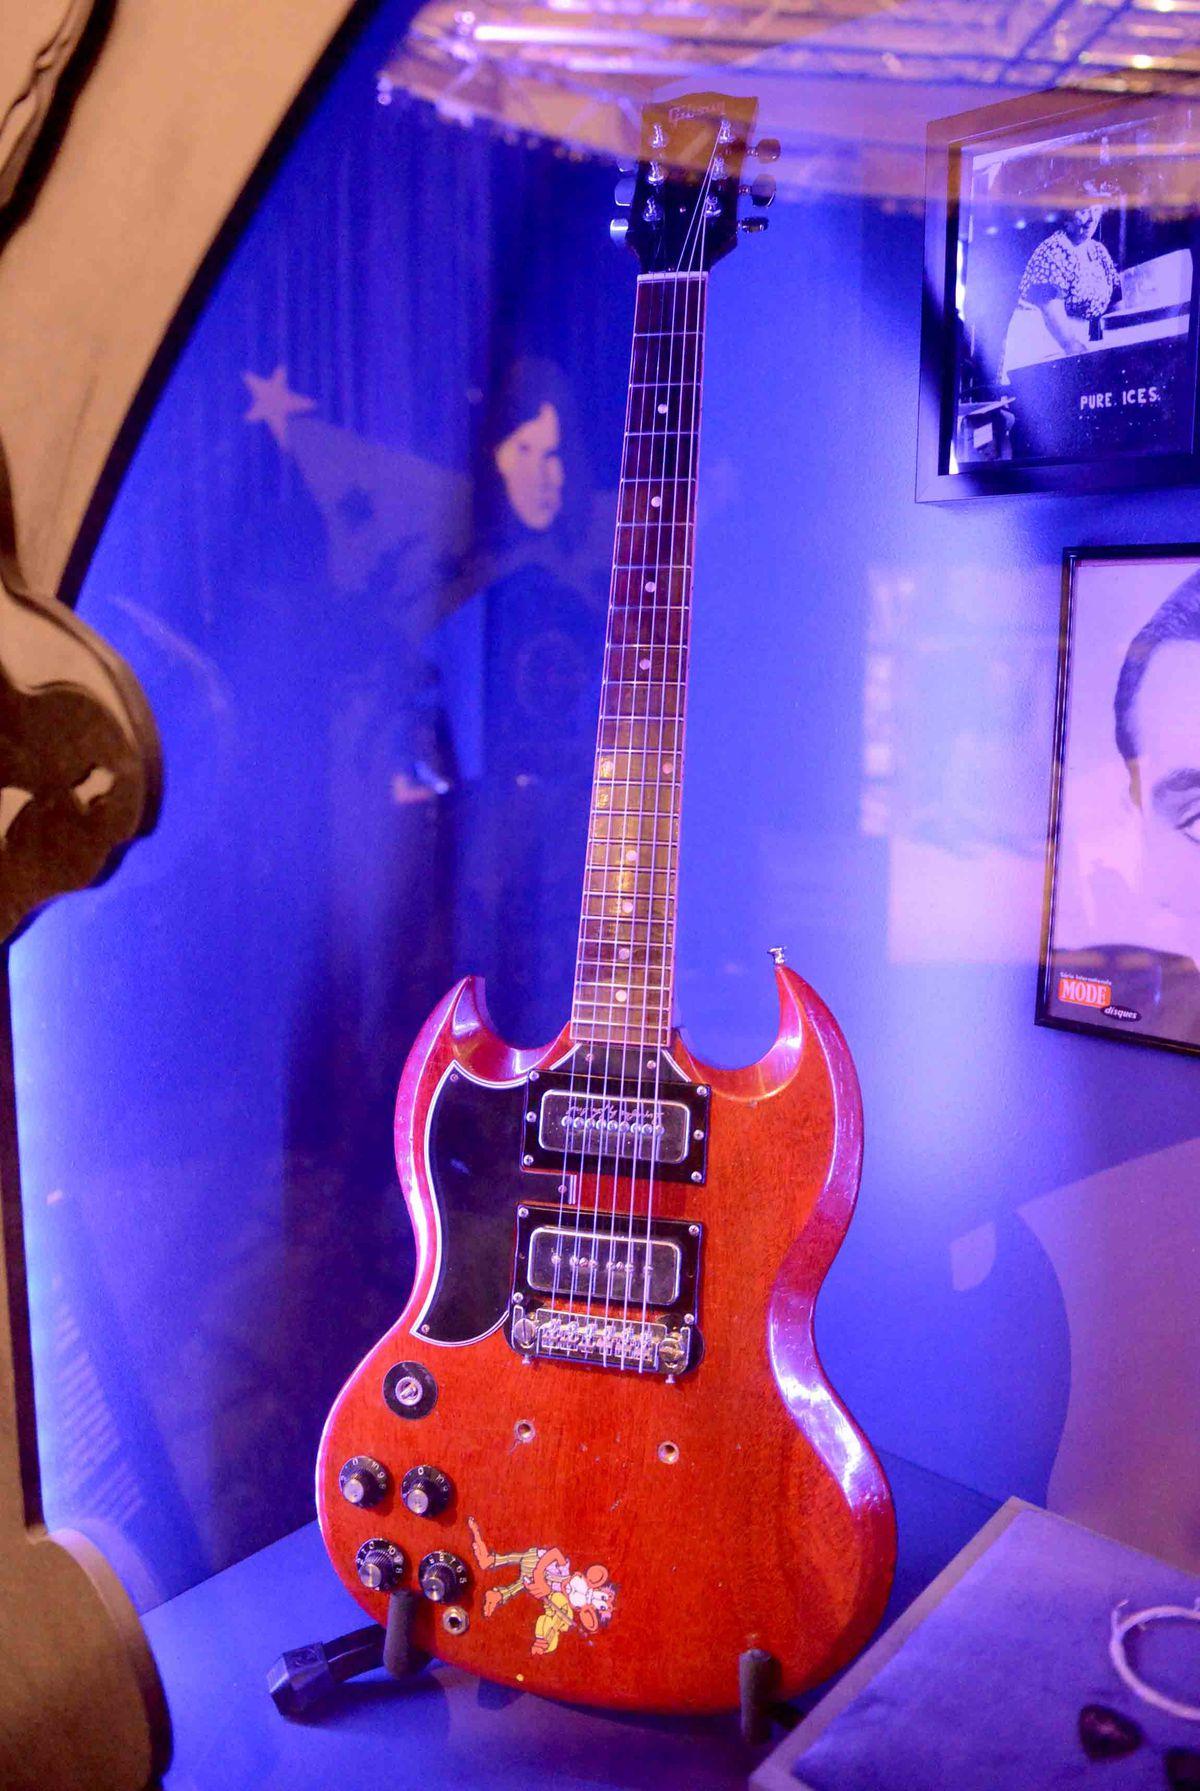 Tony Iommi's guitar